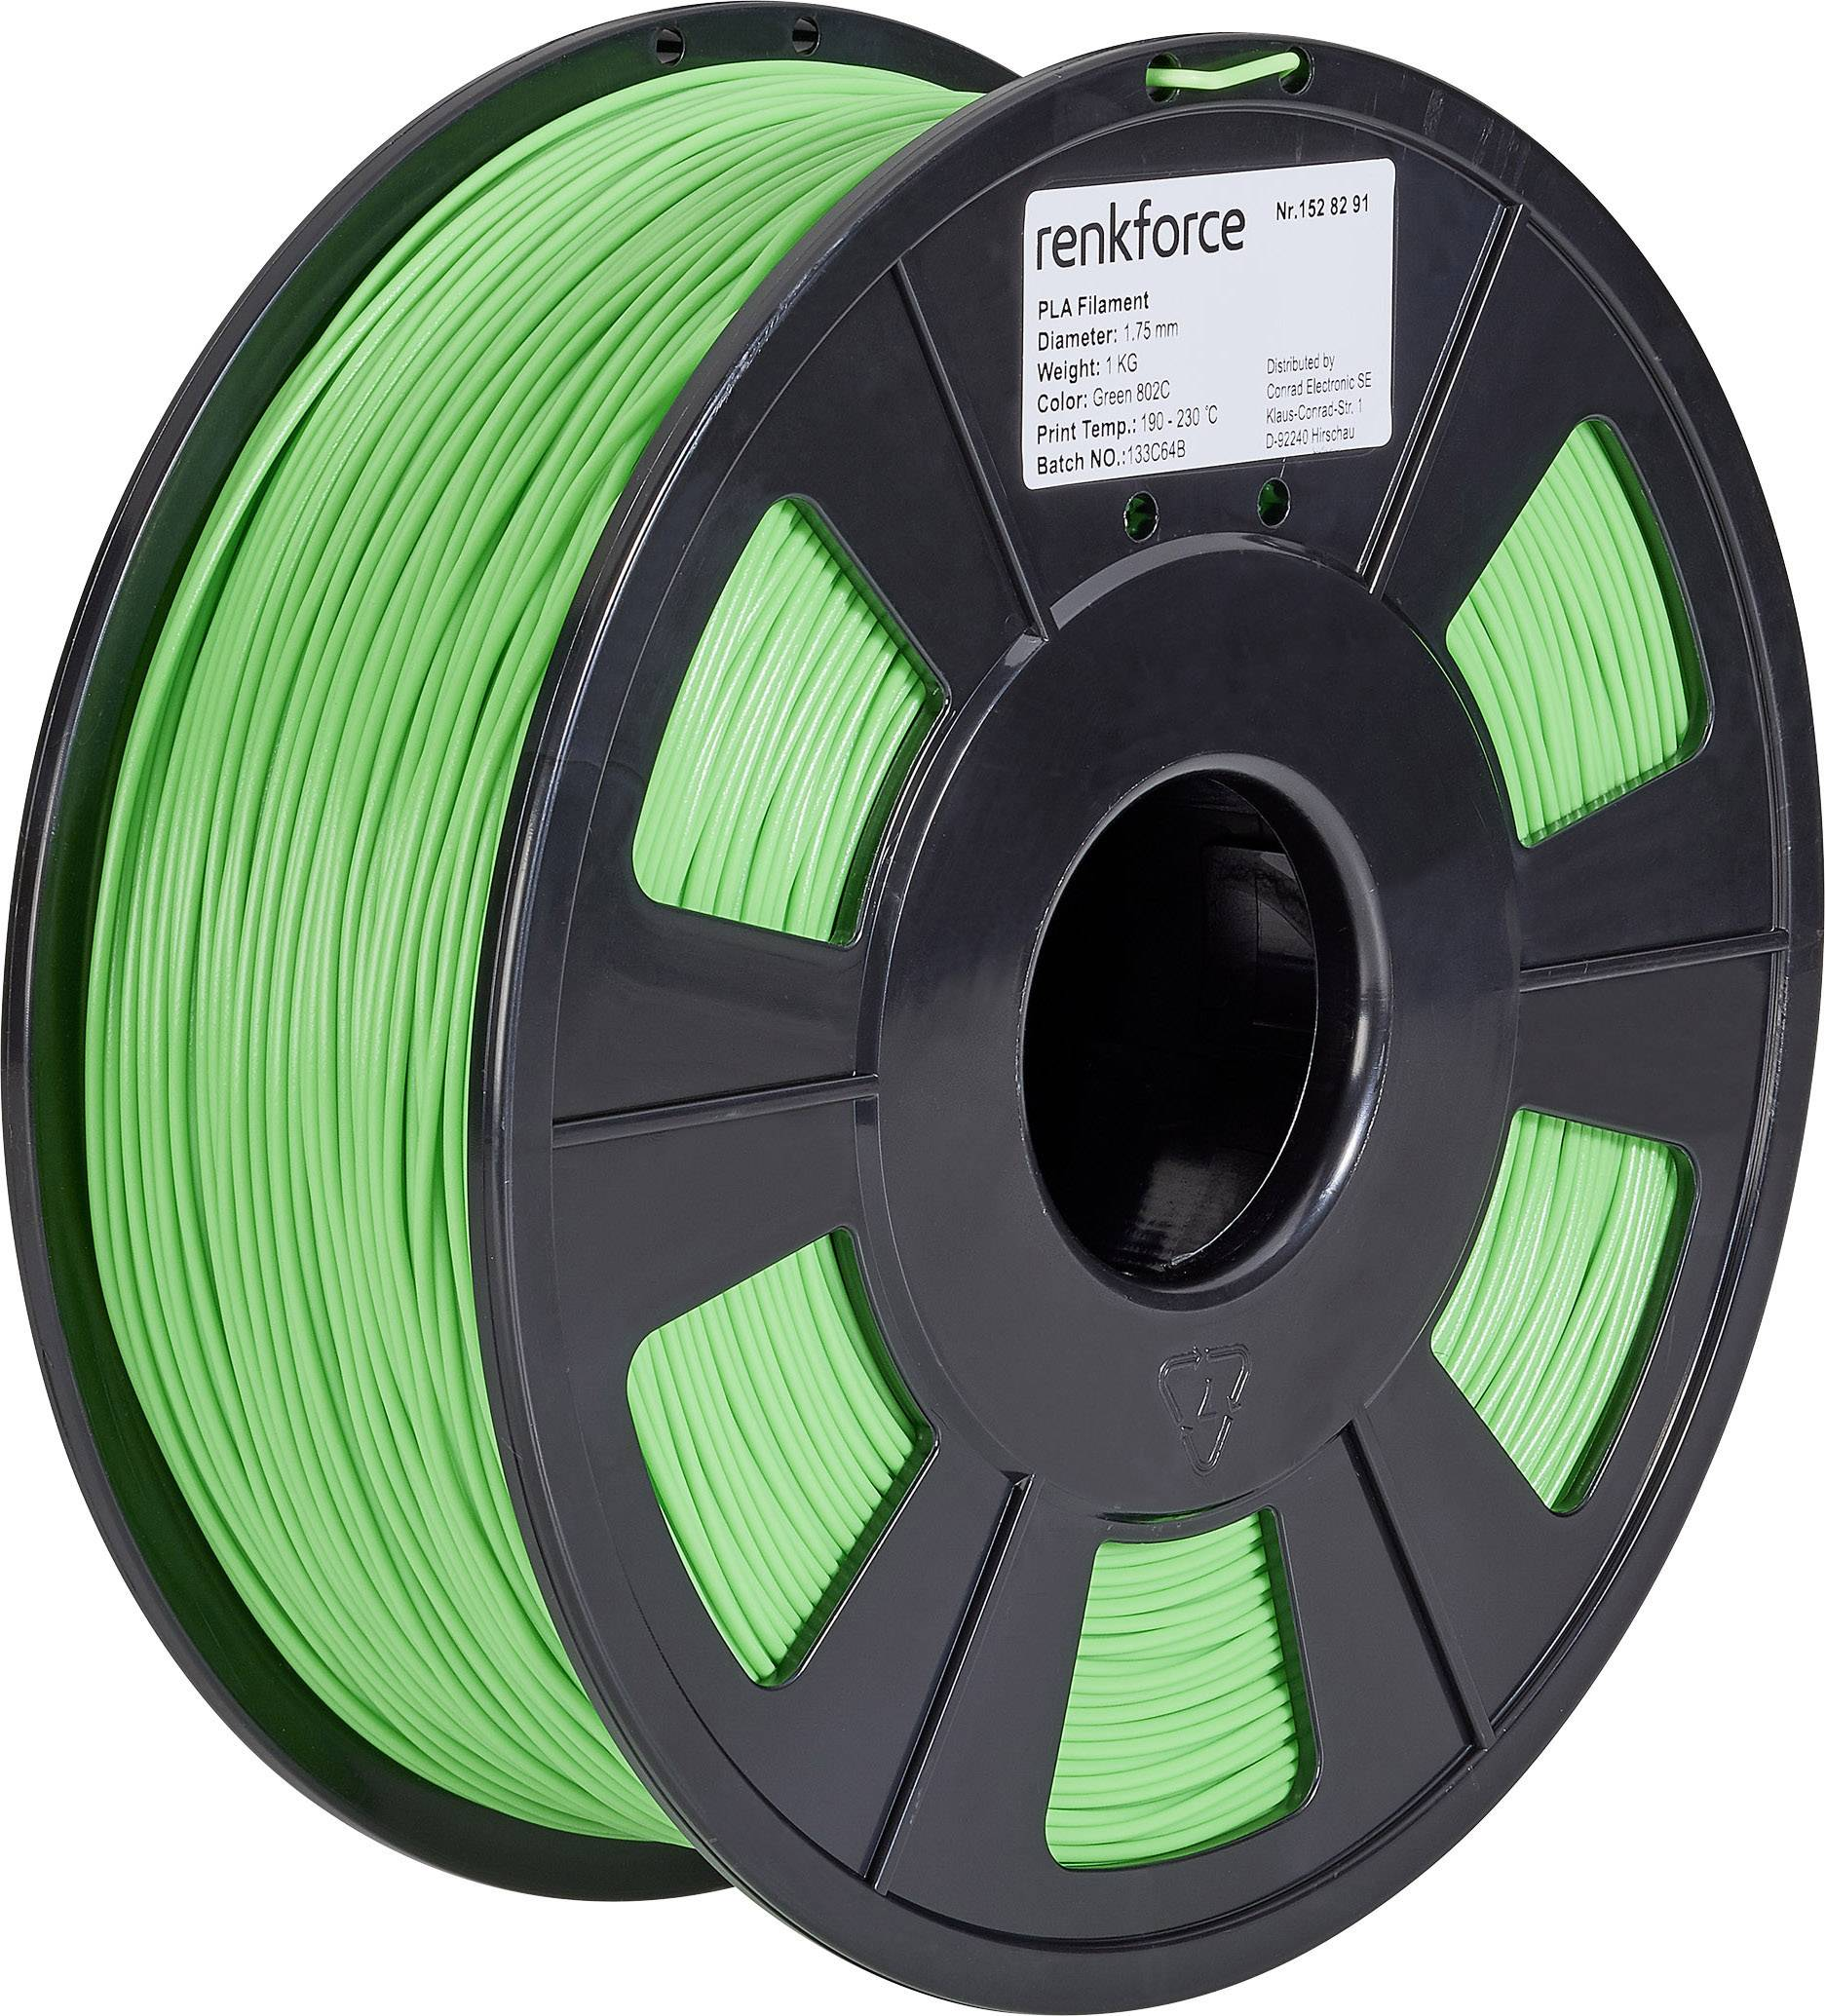 Vlákno pre 3Dtlačiarne, Renkforce 01.04.01.1110, PLA plast , 1.75 mm, 1 kg, zelená